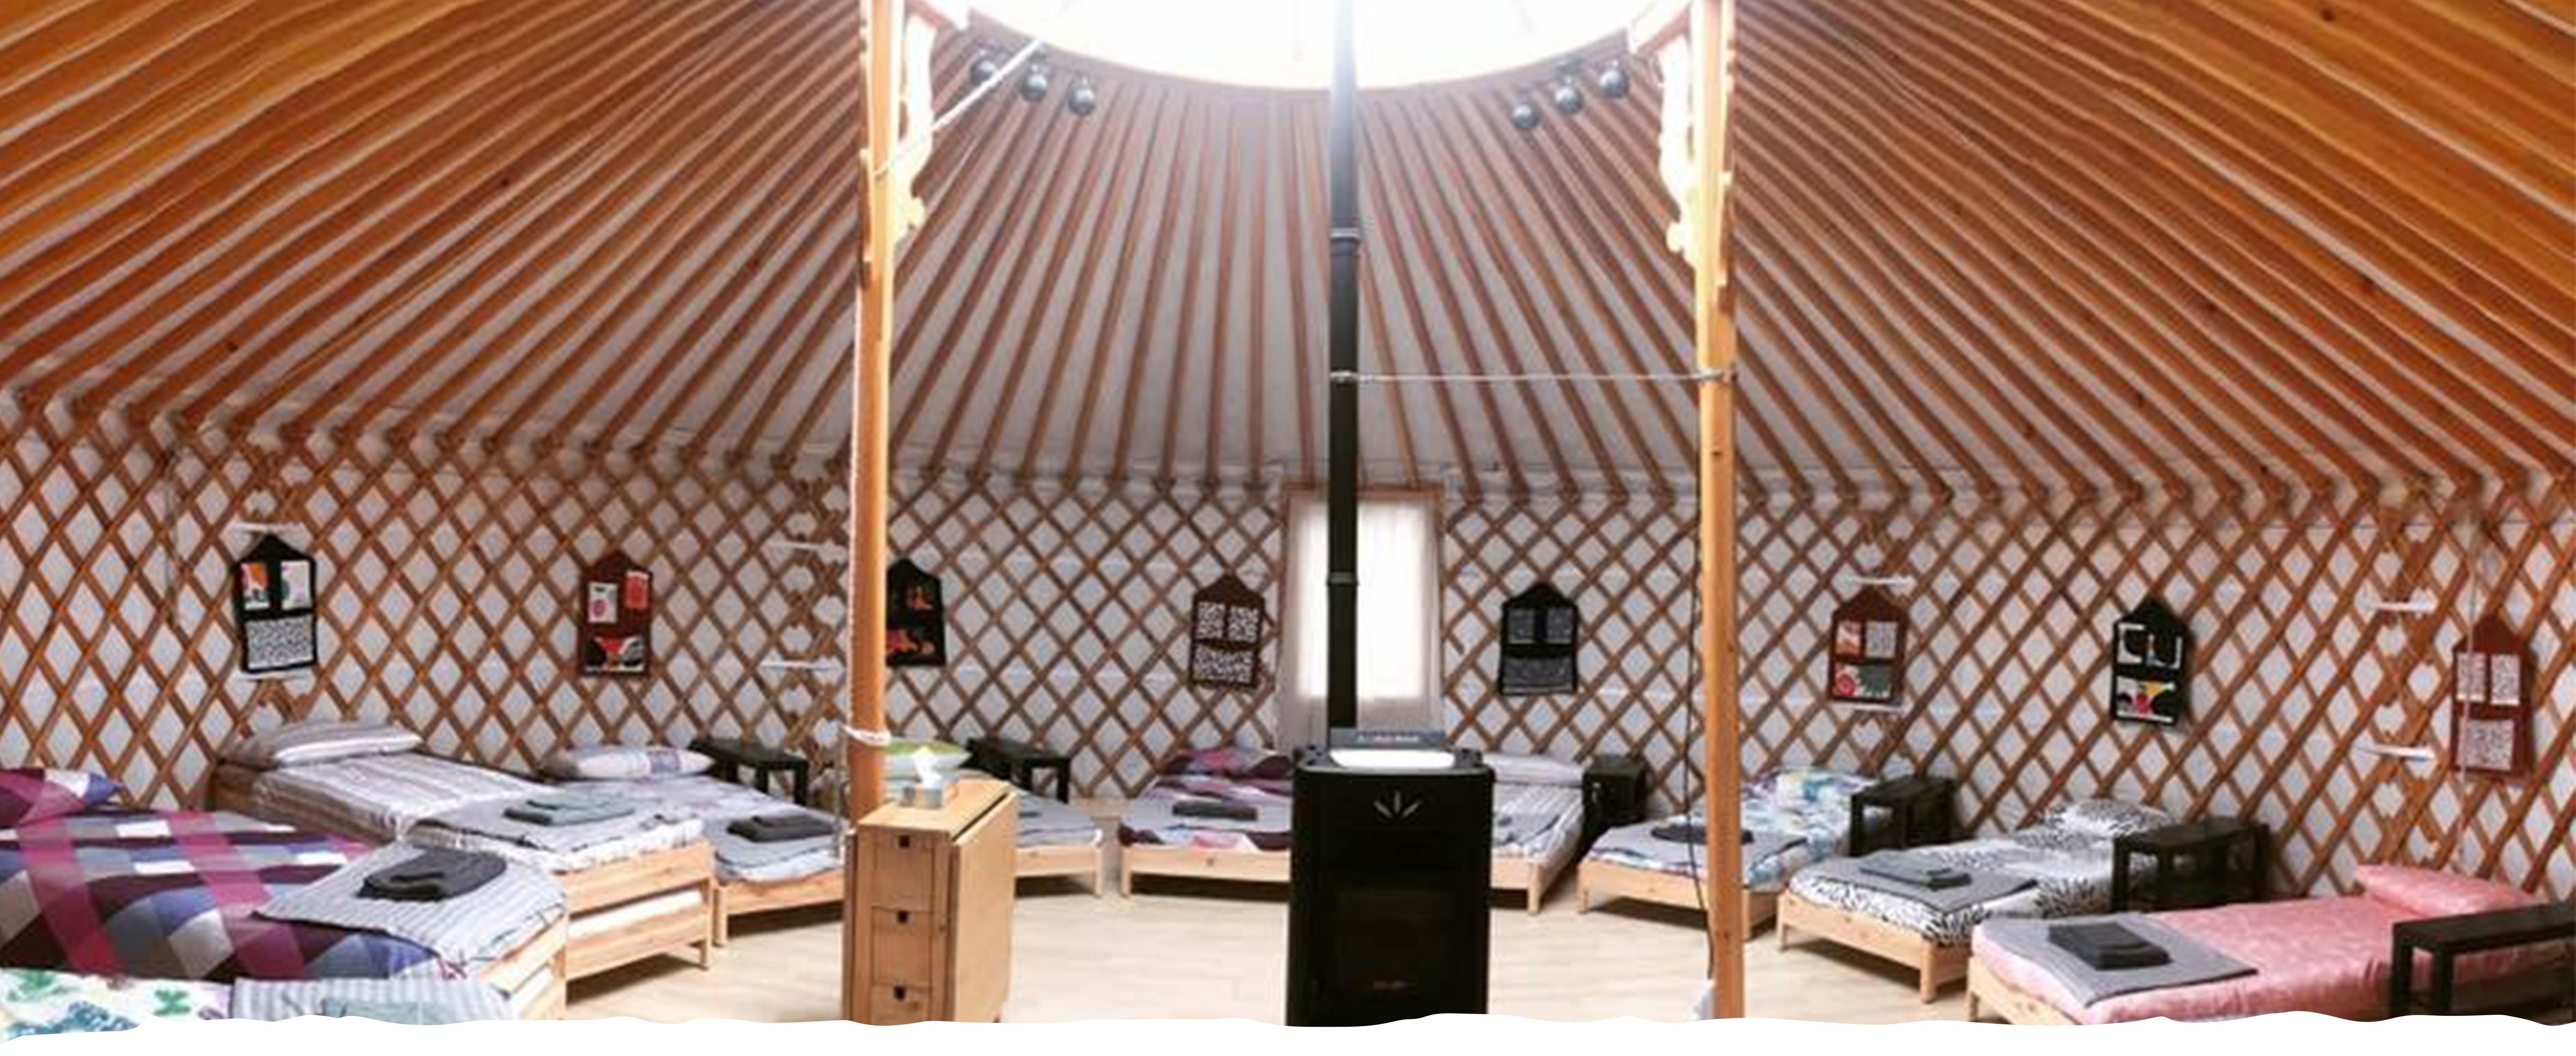 avventura-in-yurta